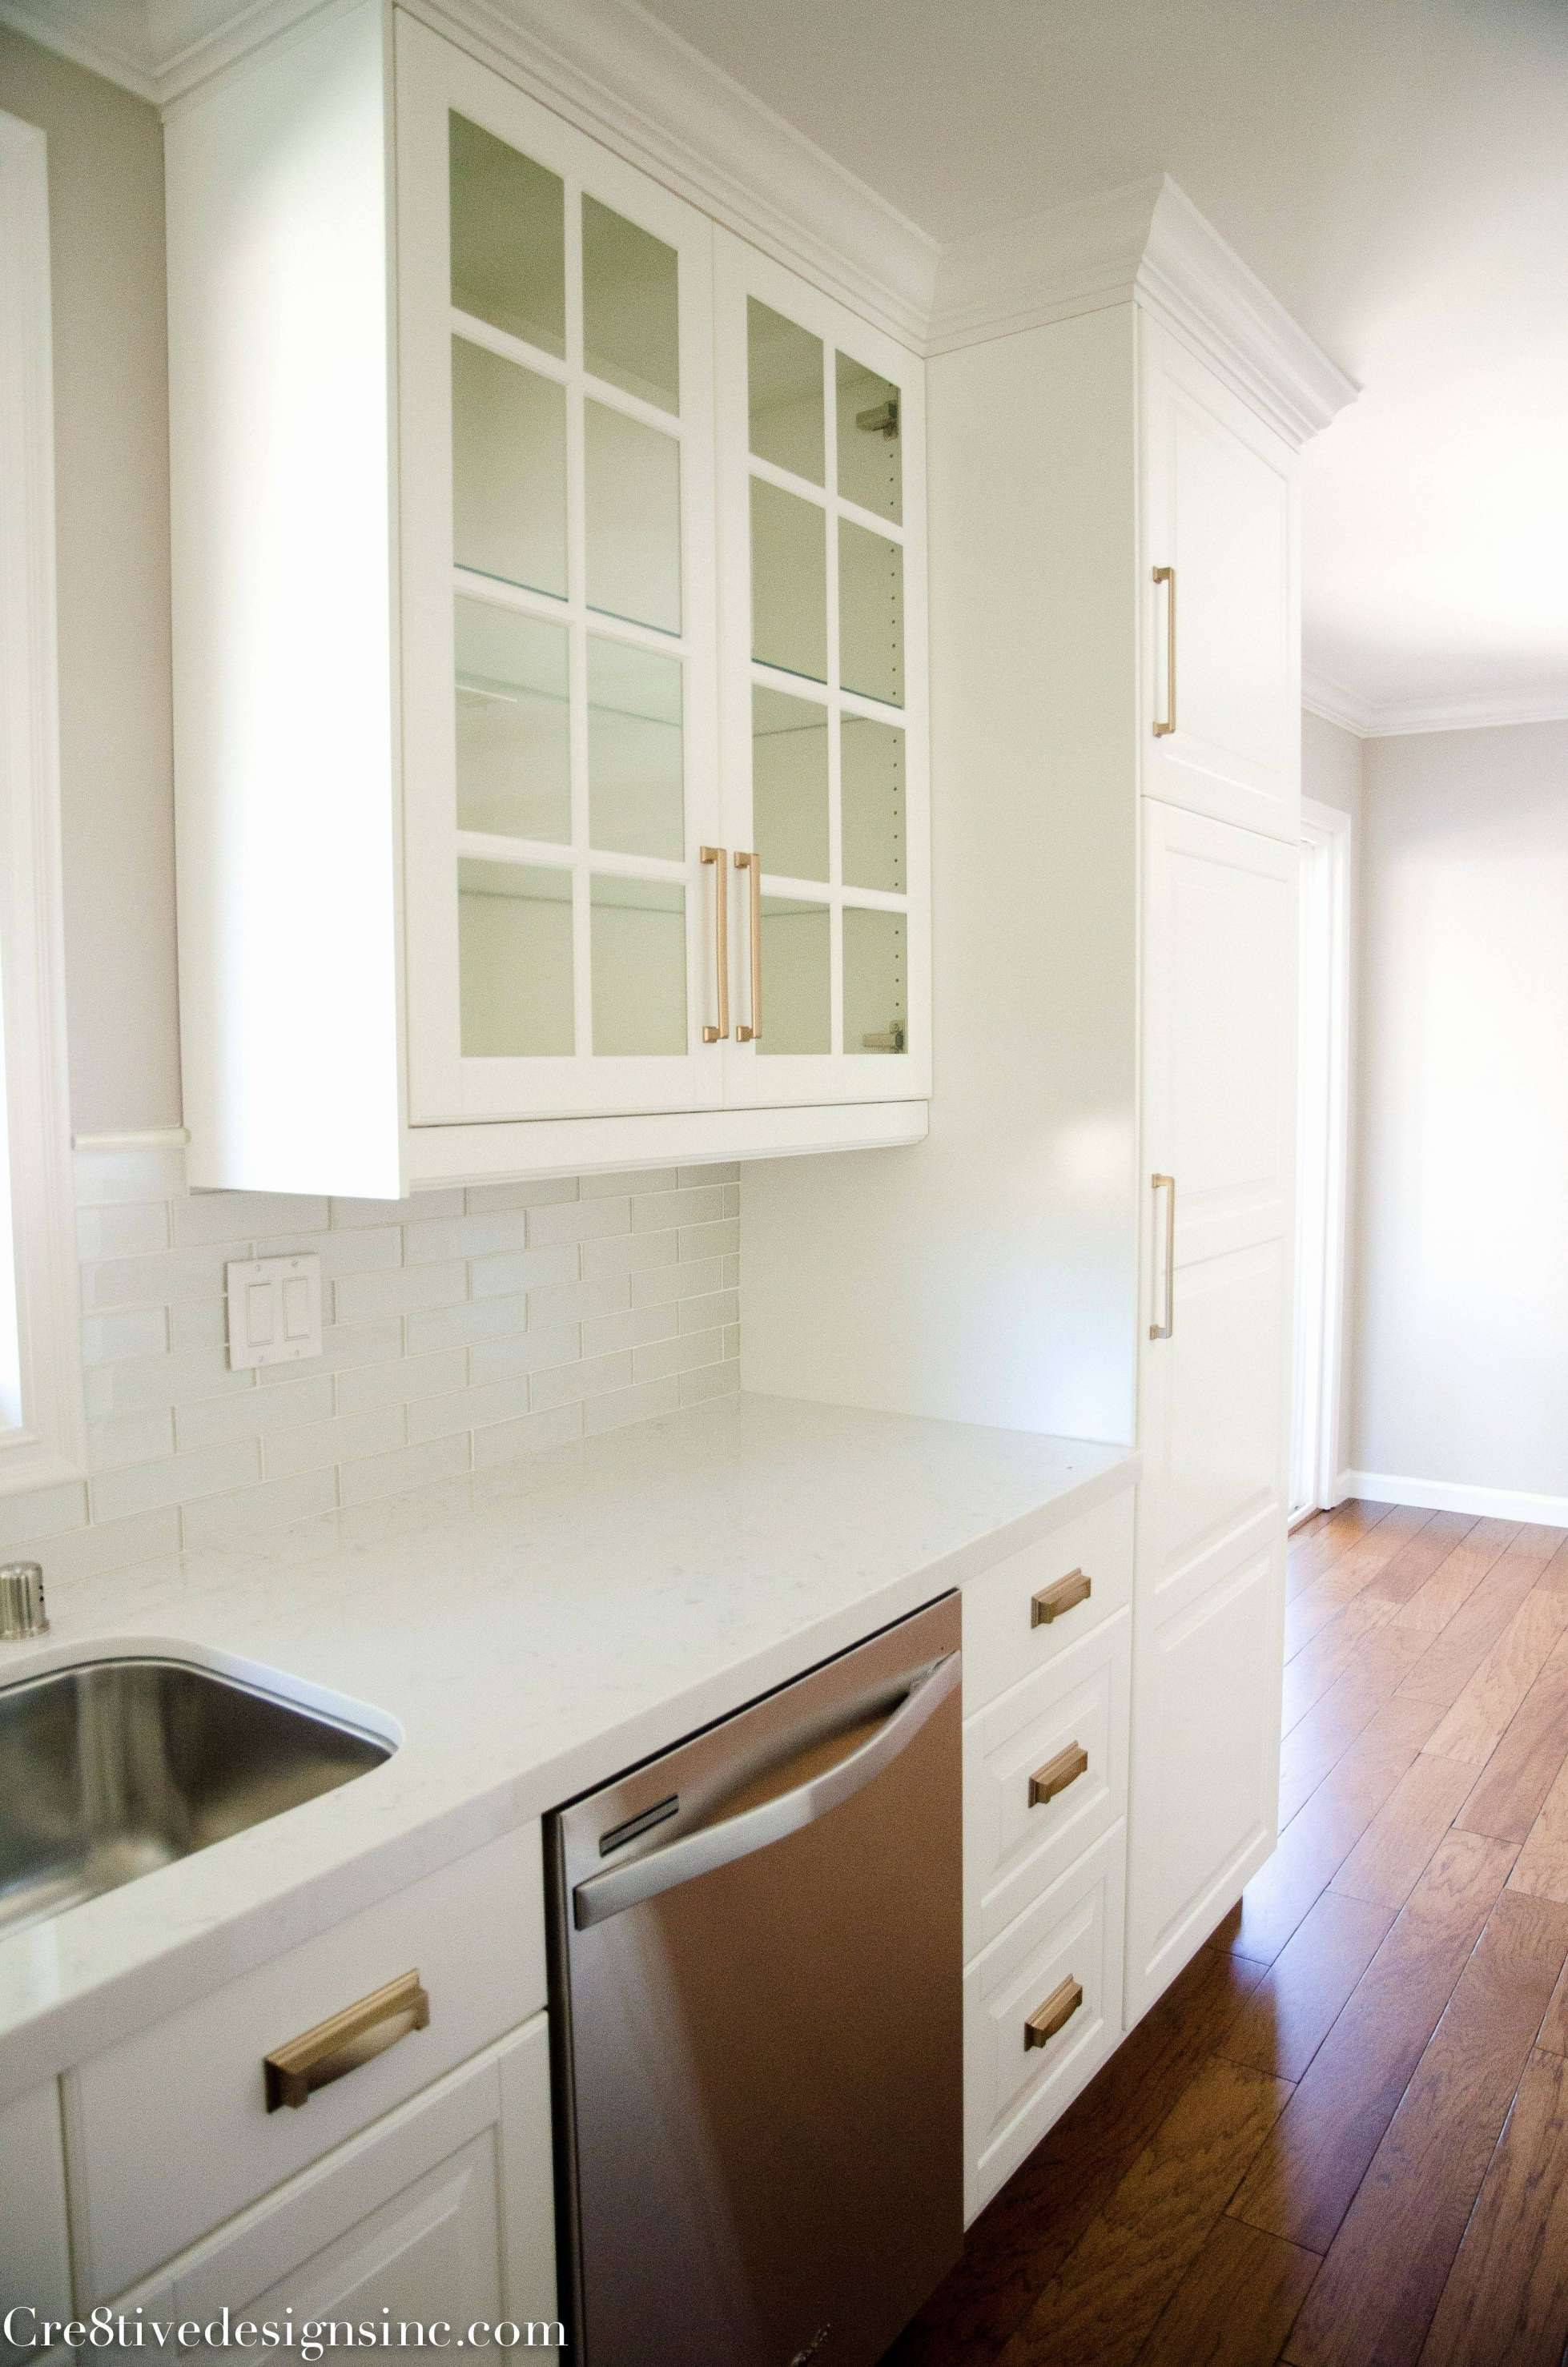 Kitchen Remodel Design Template